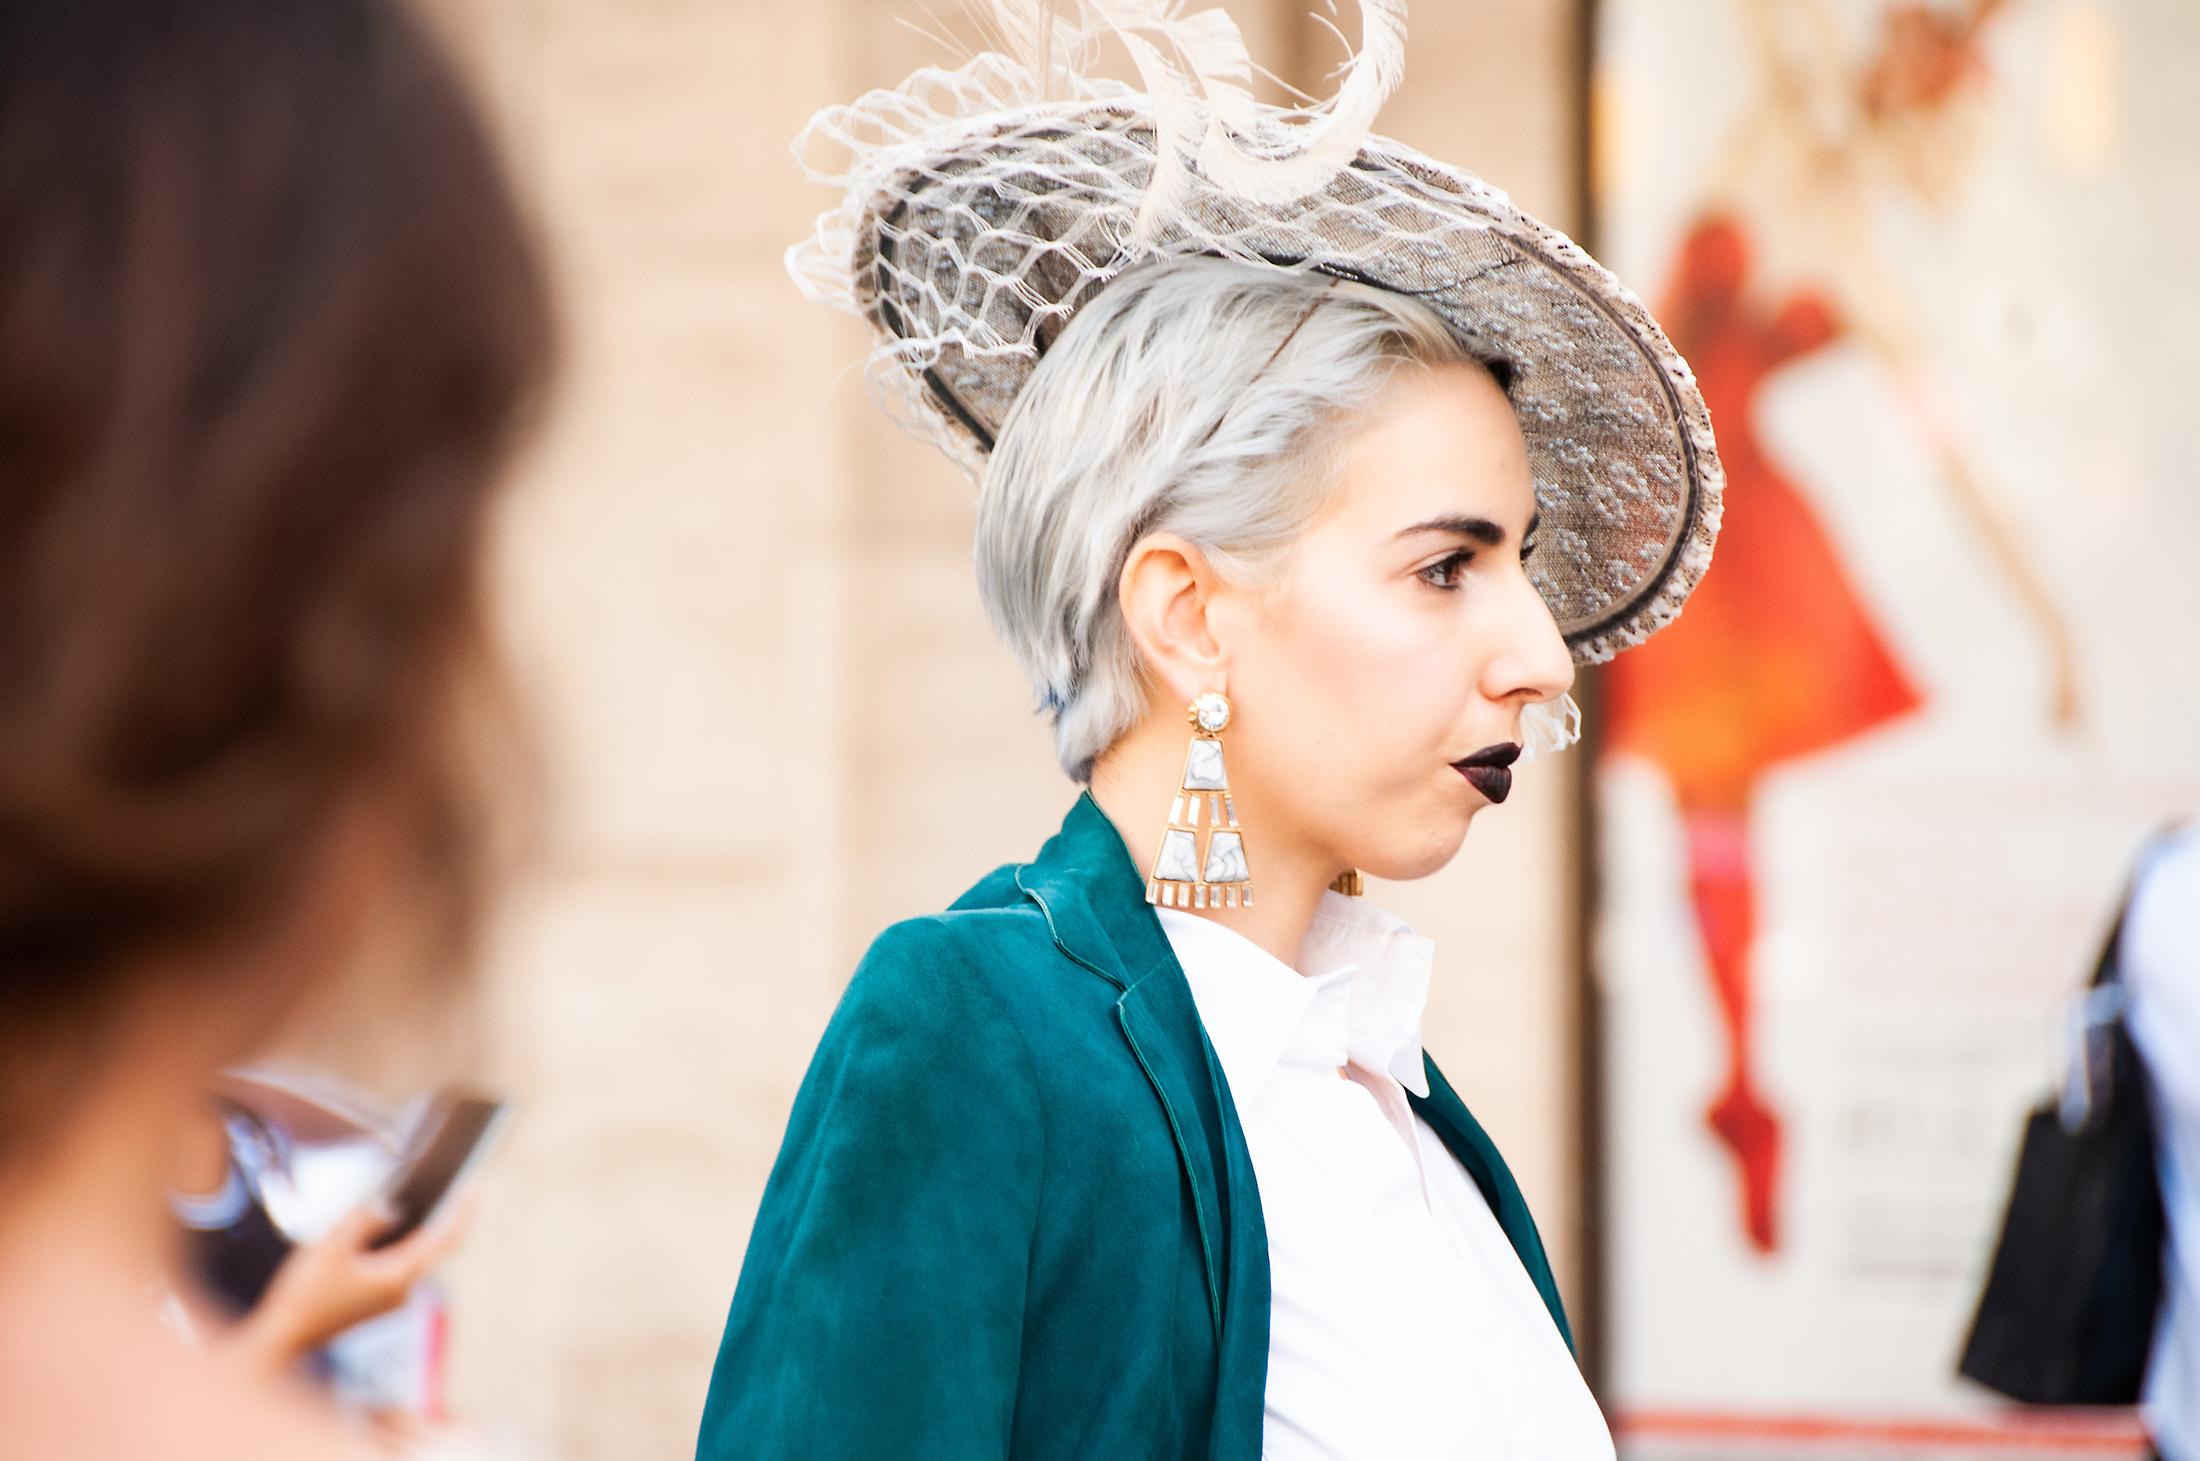 lady-hat.jpg